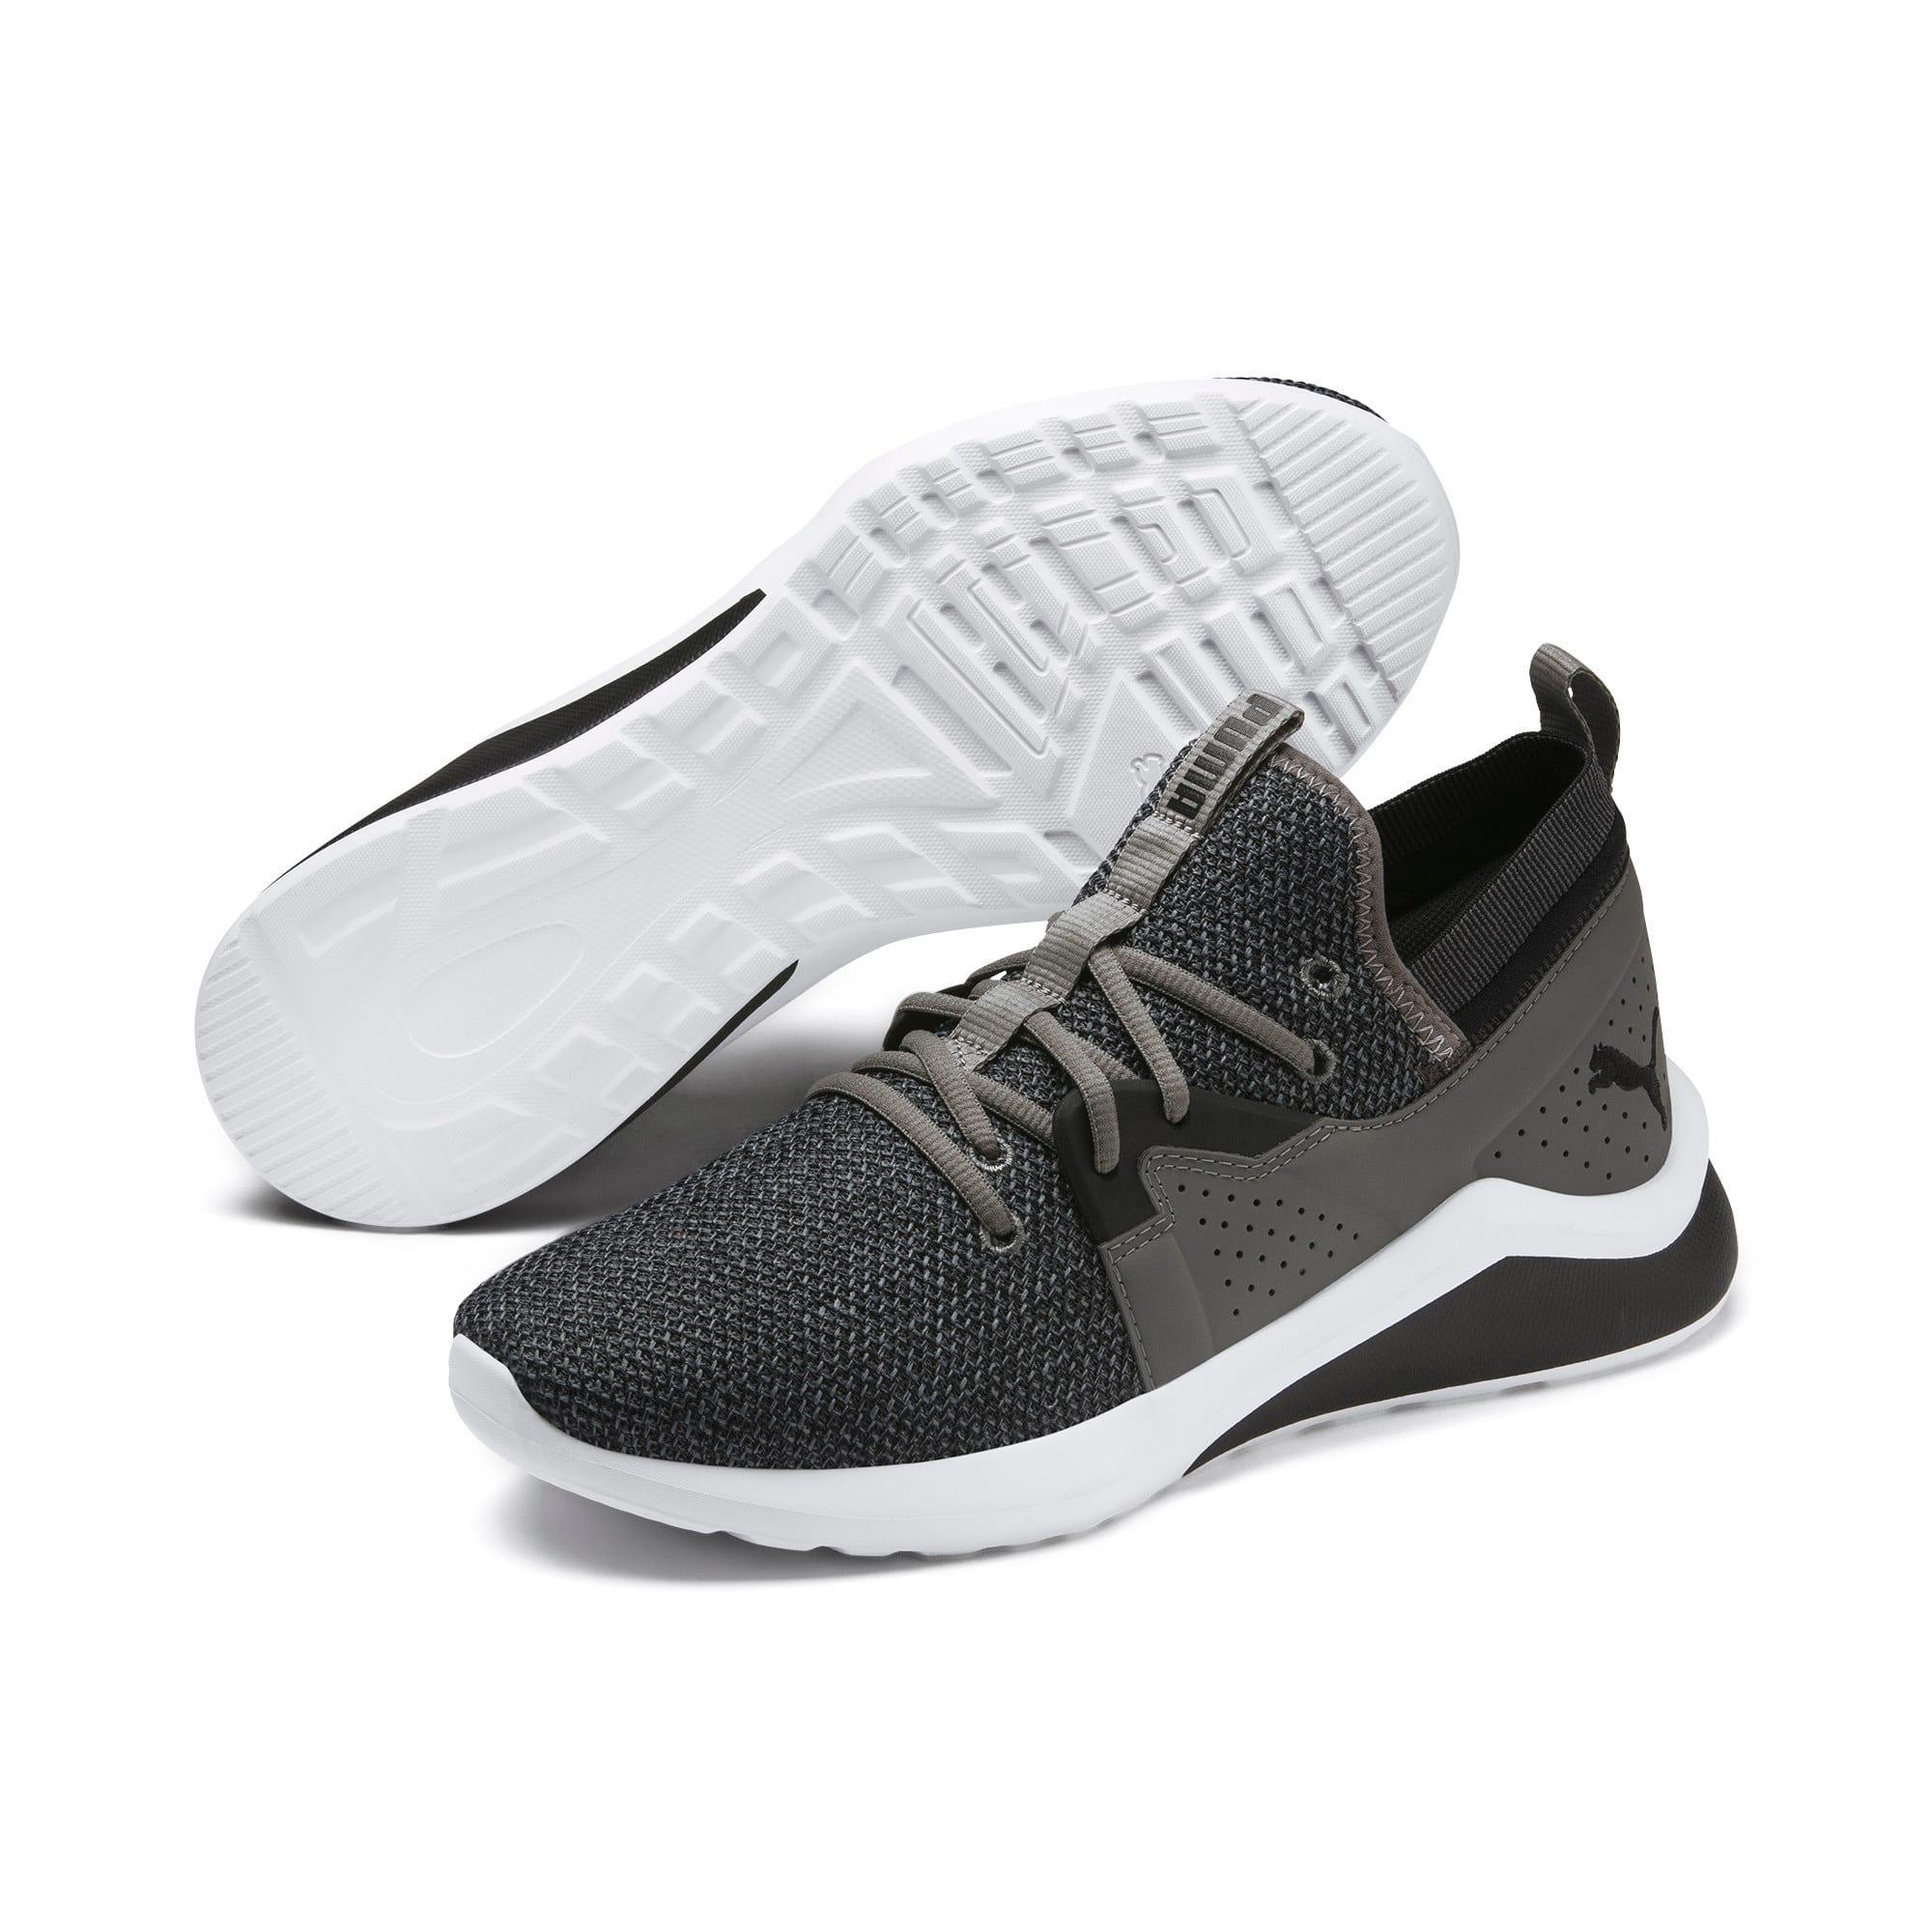 Thumbnail 4 of Emergence Men's Running Shoes, CASTLEROCK-Puma Black, medium-IND